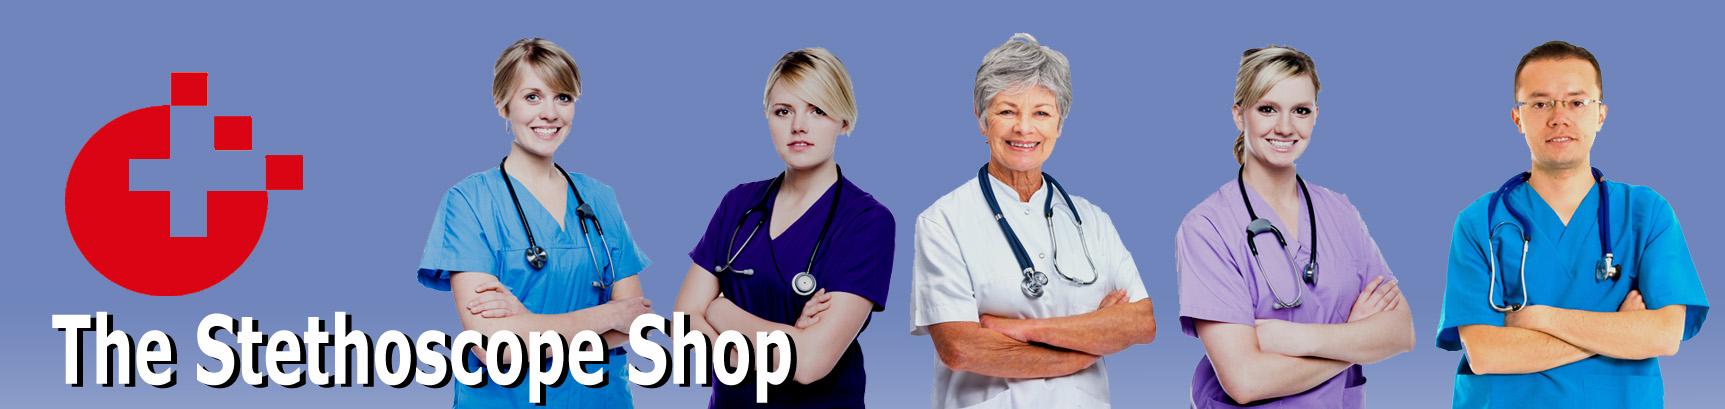 The Stethoscope Shop logo